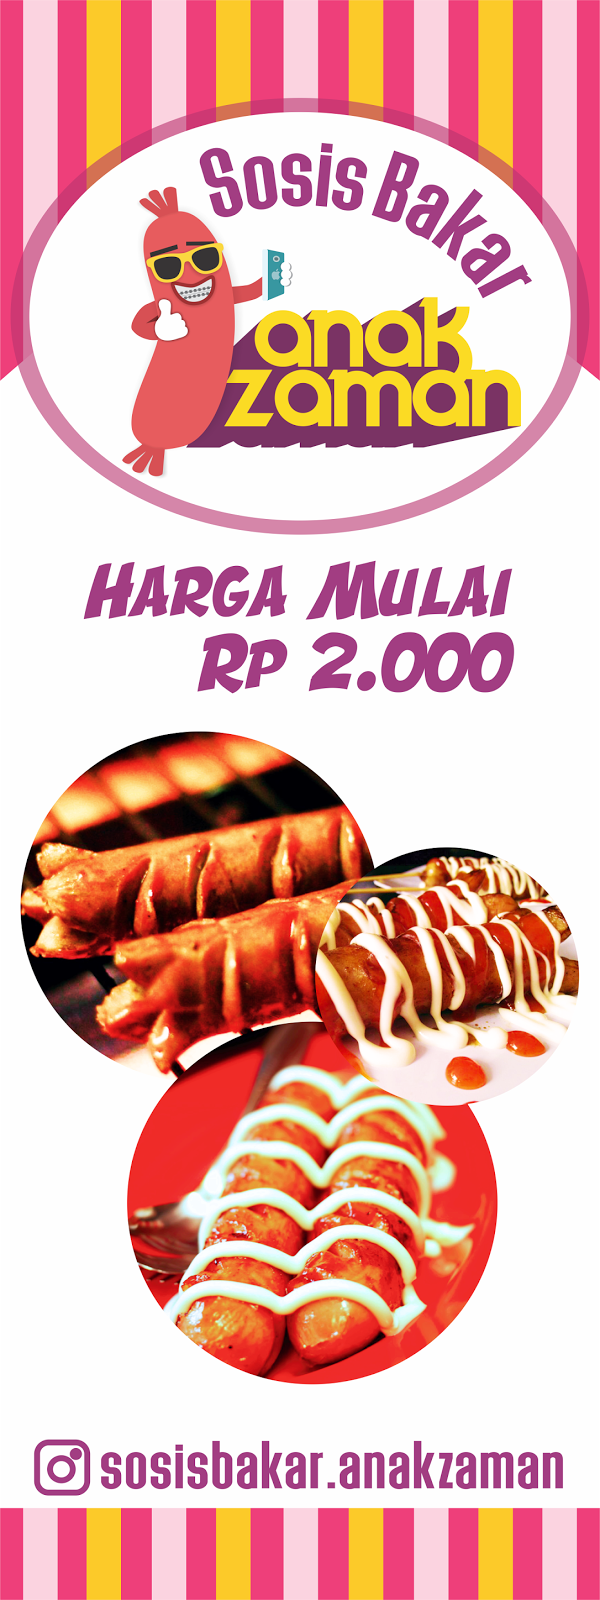 download gambar banner sosis bakar gambar makanan blogger